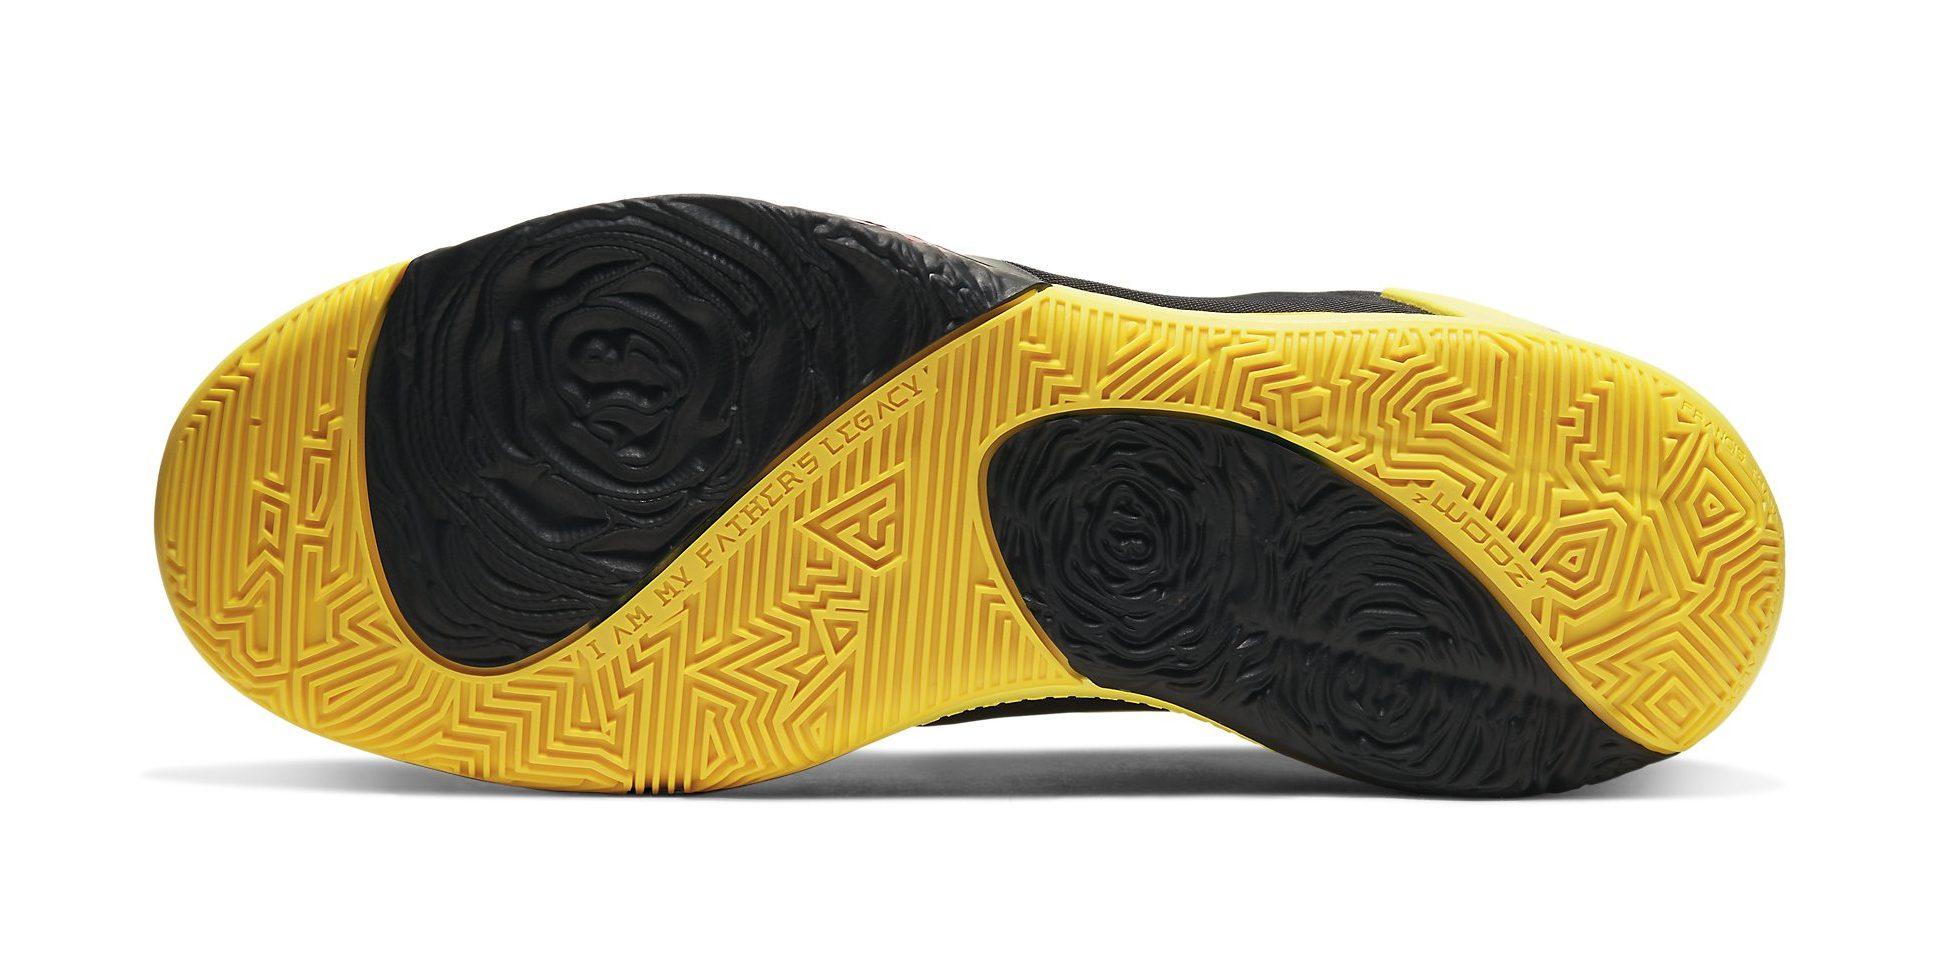 nike 8 vapor woven amazon boots sale girls size